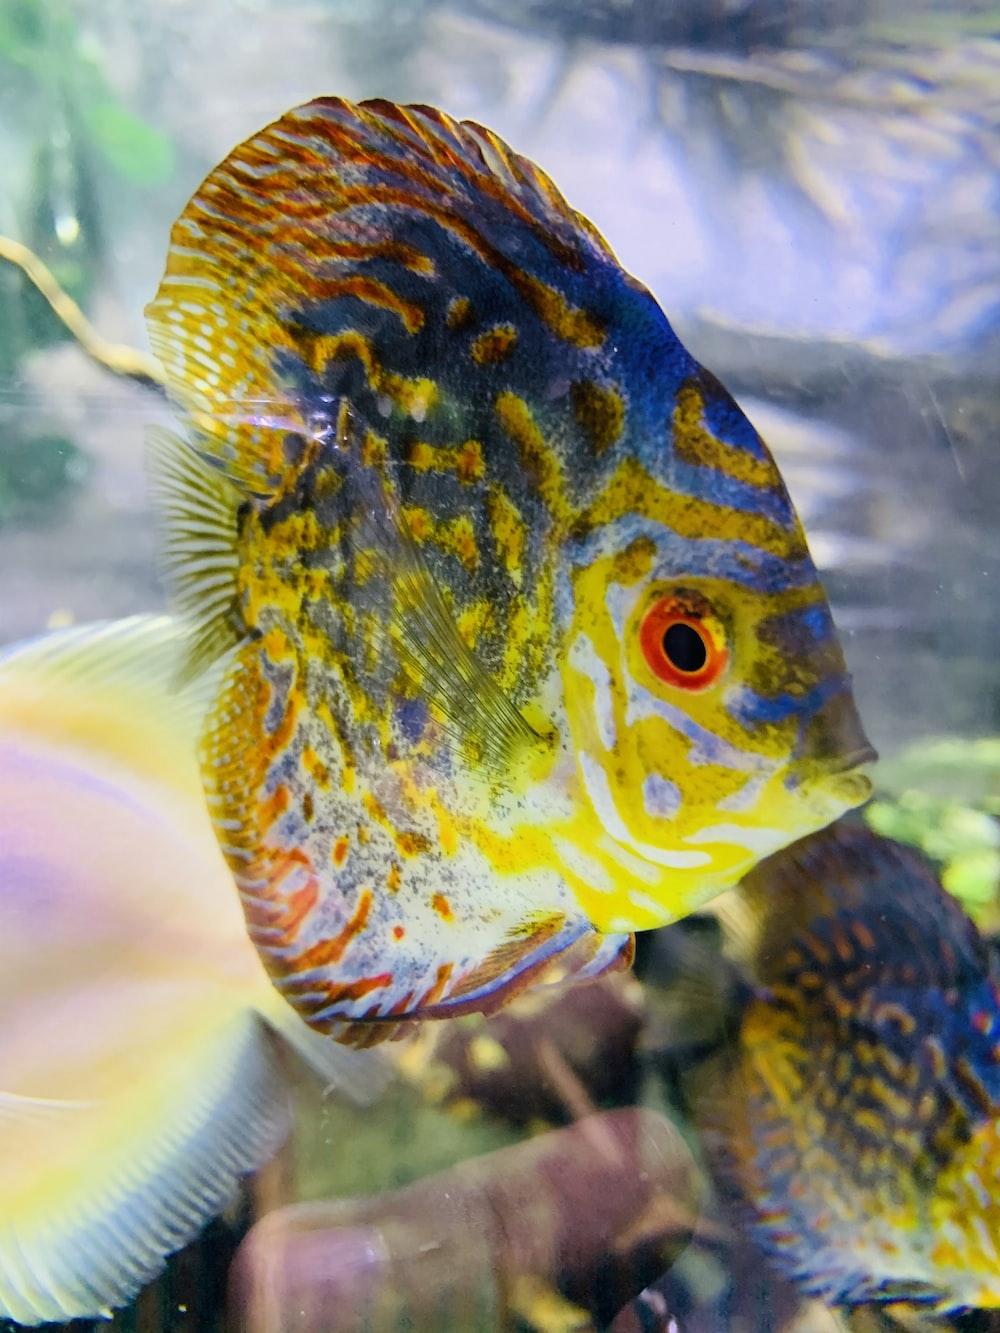 orange and blue fish in fish tank